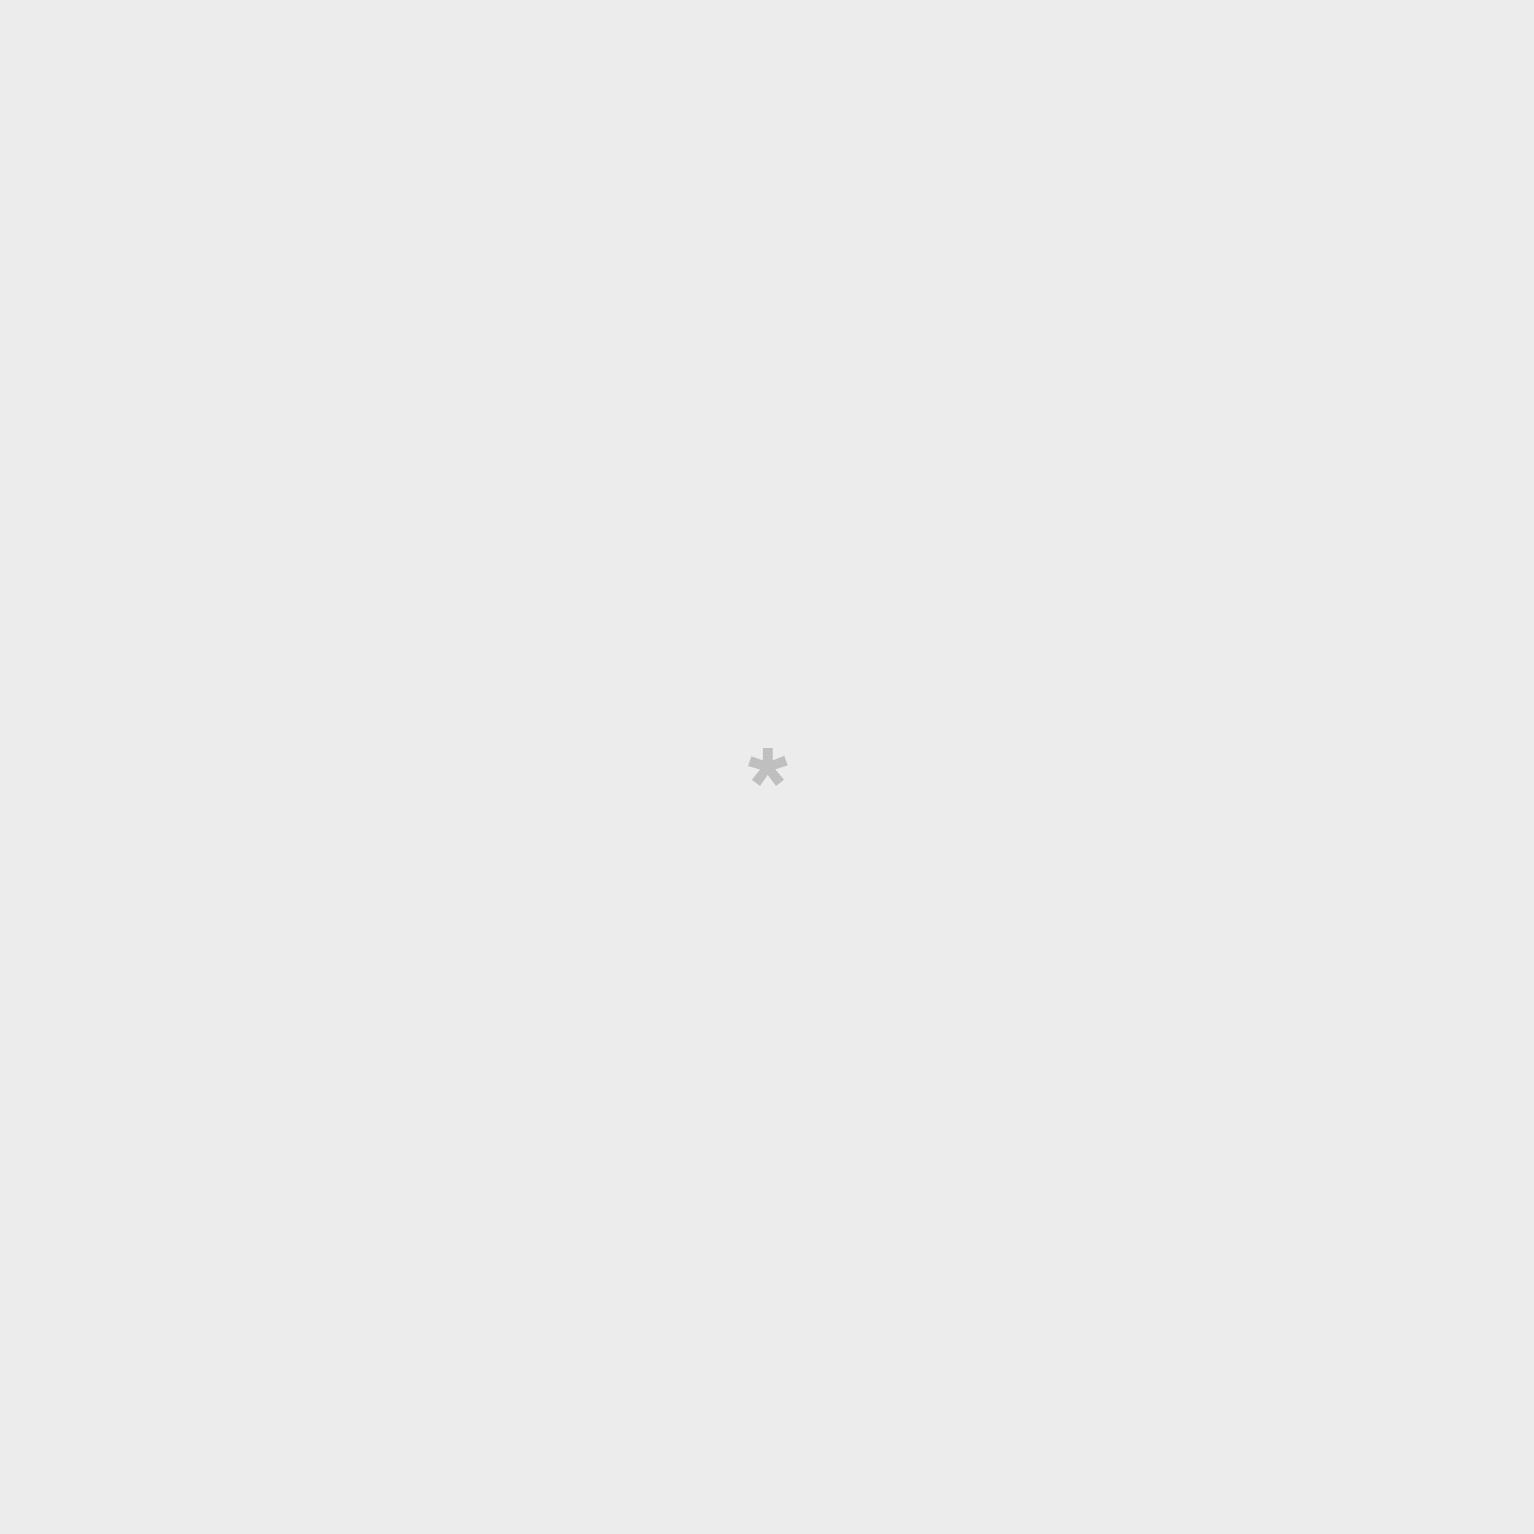 Pink Wonderful Words bracelet - You're wonderful